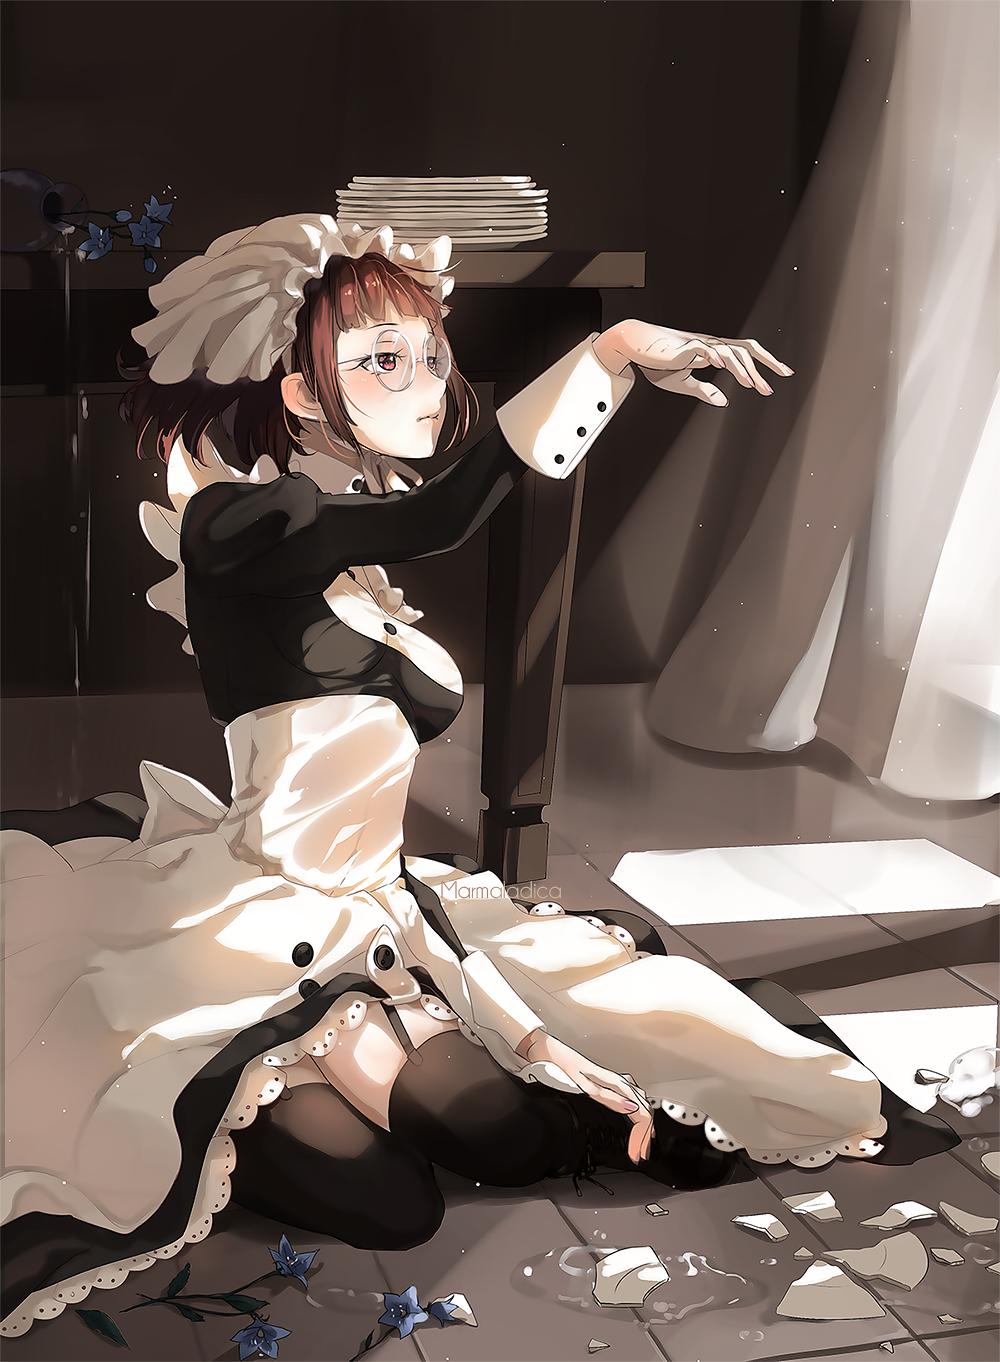 Anime 1000x1362 Kuroshitsuji  anime girls anime glasses stockings dress